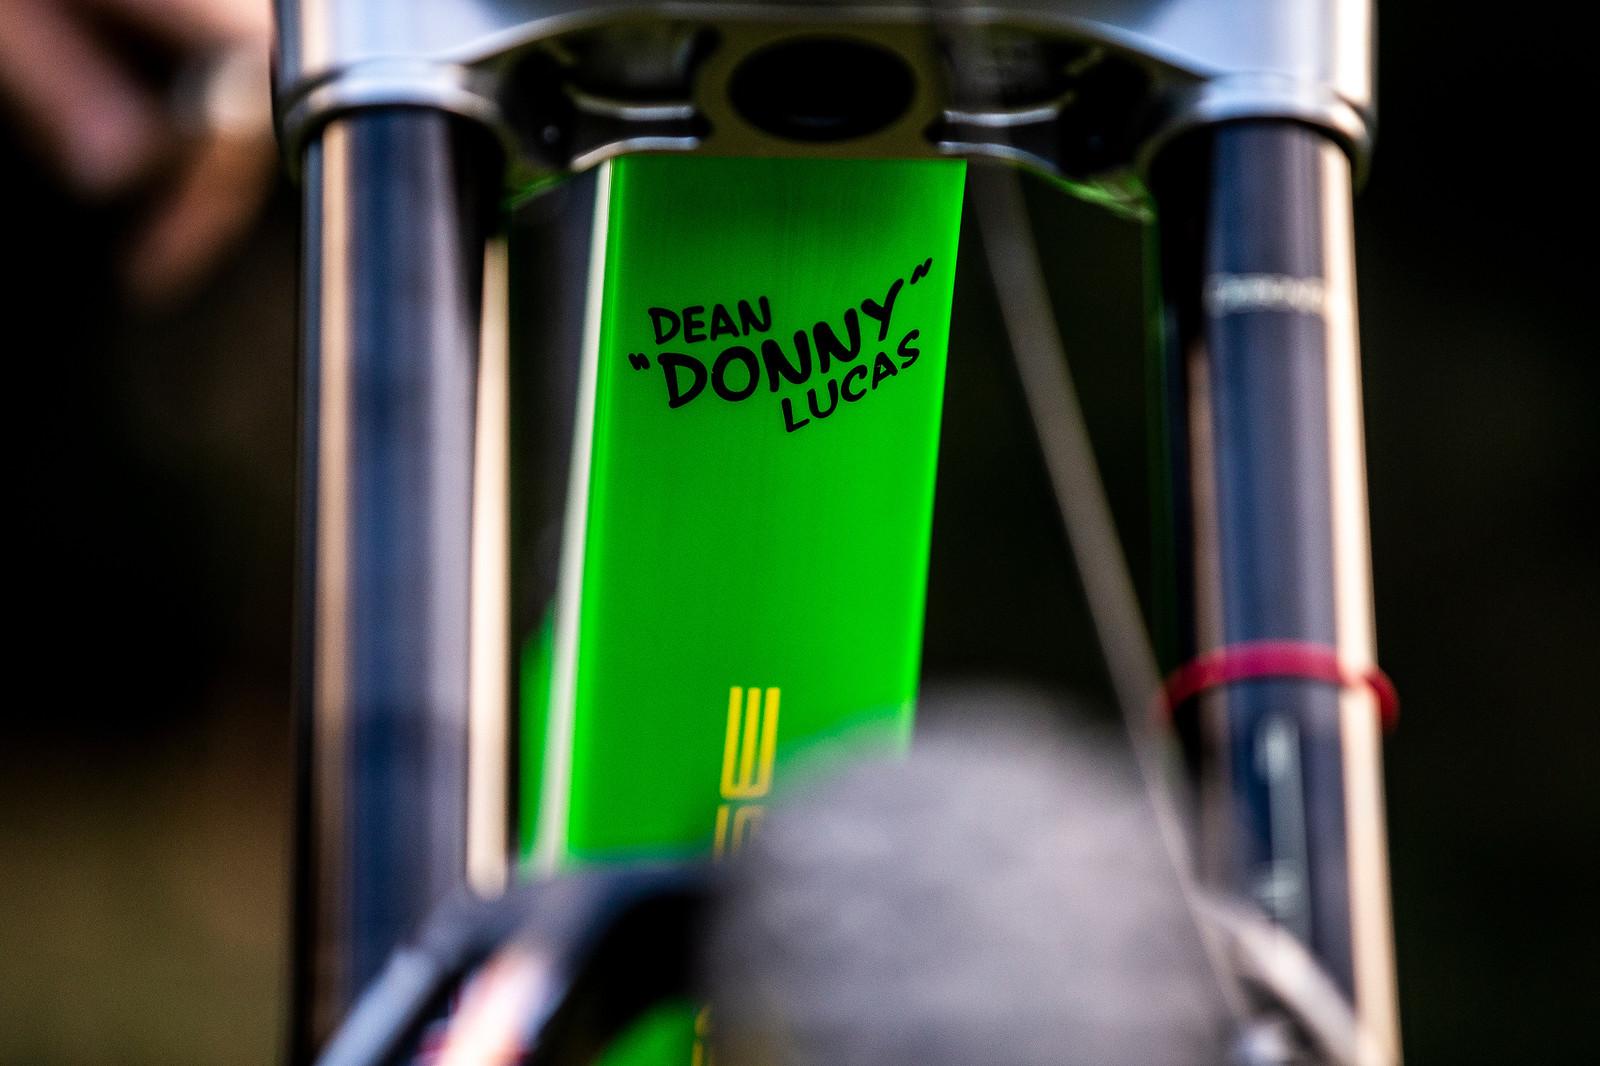 Donny the Don - WORLD CHAMPS BIKE - Dean Lucas' Intense M29 - Mountain Biking Pictures - Vital MTB